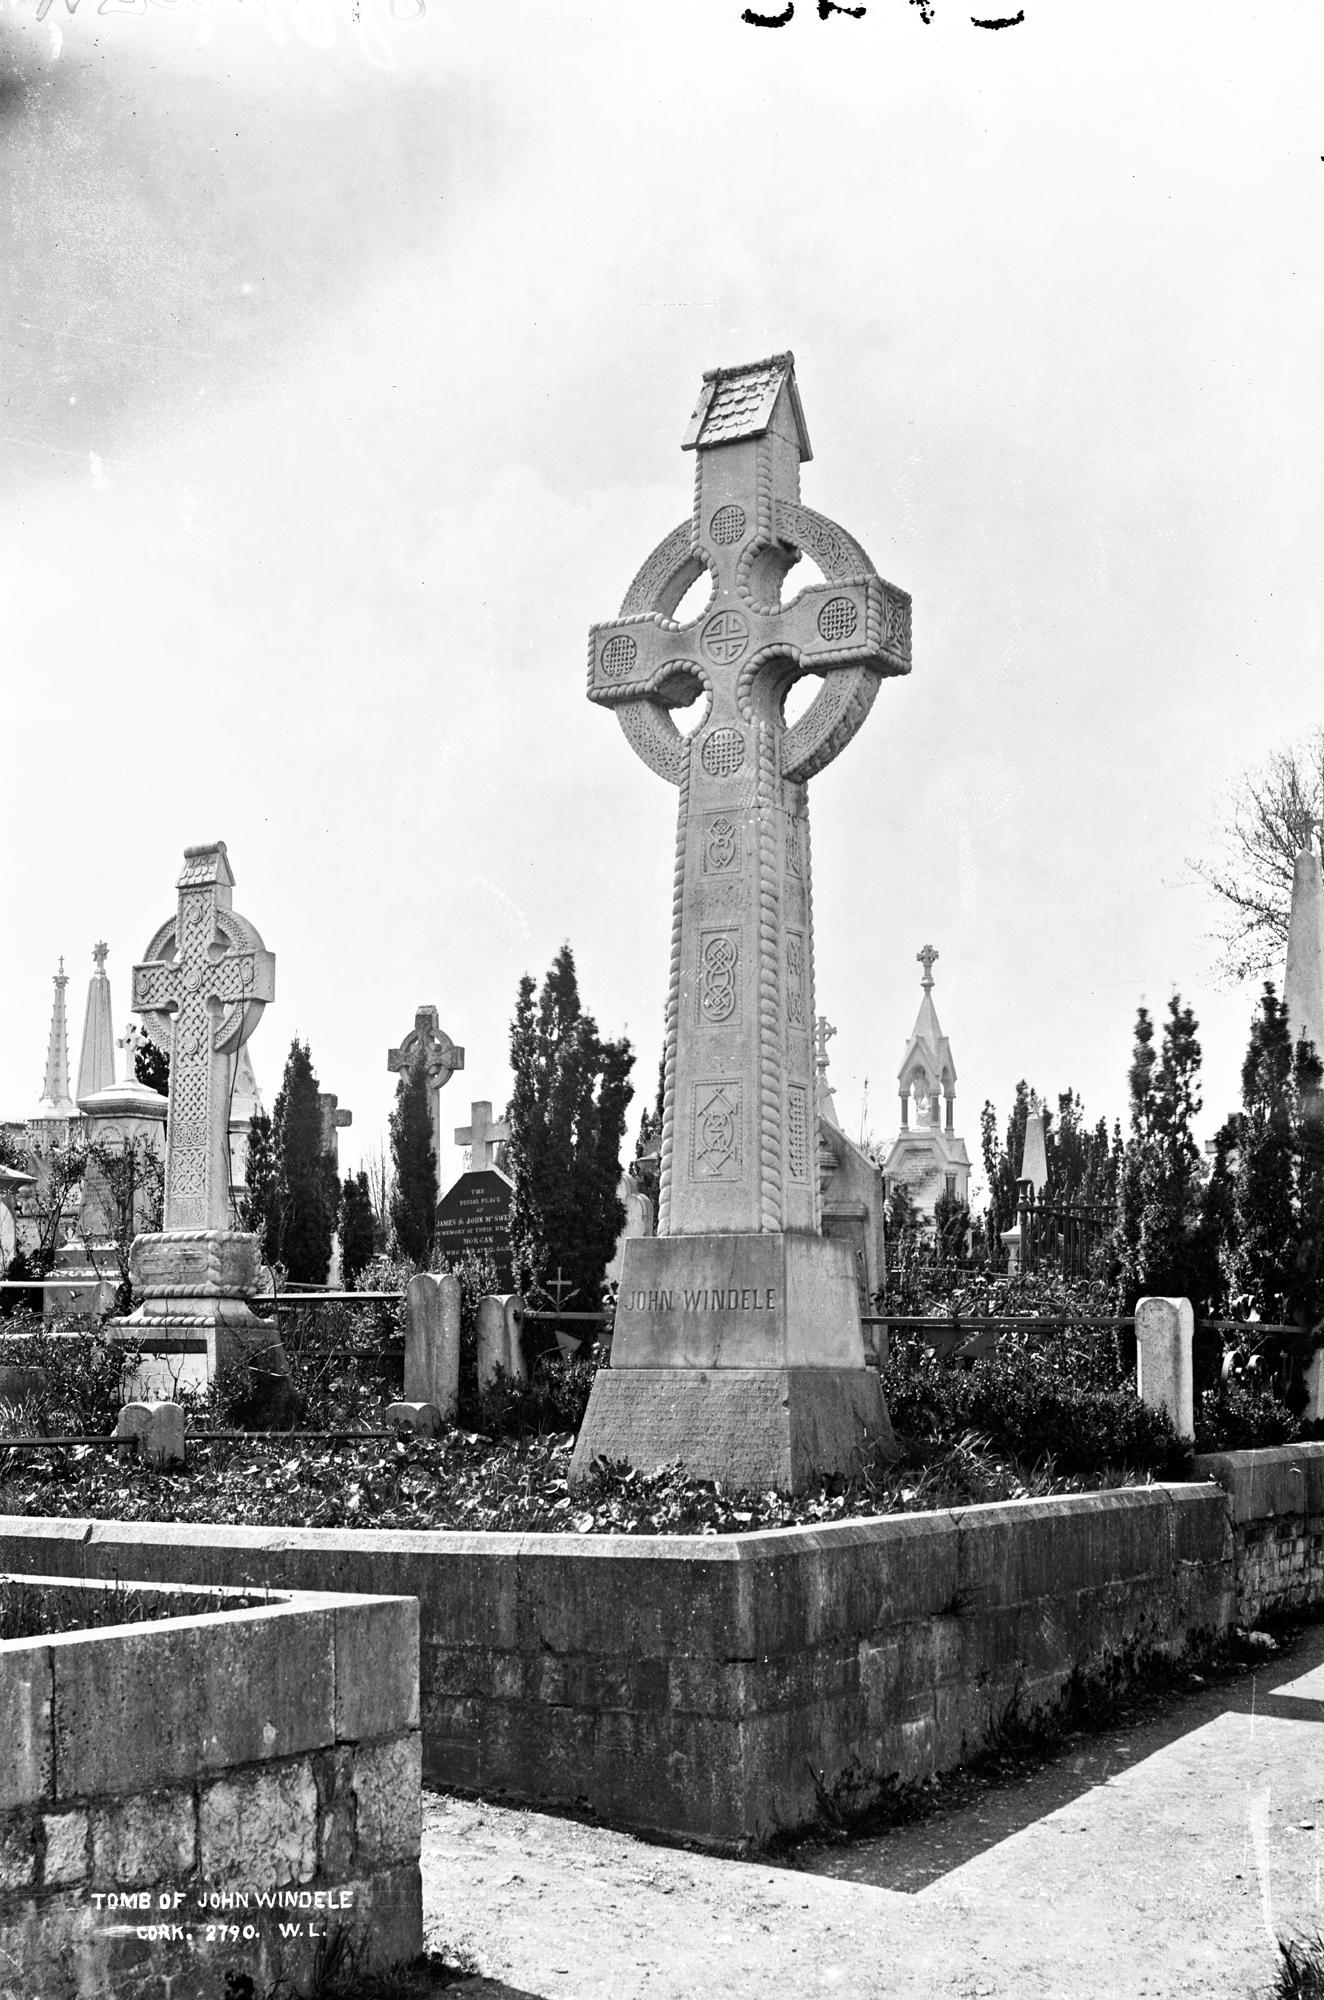 John Windele's Tomb, Cork City, Co. Cork